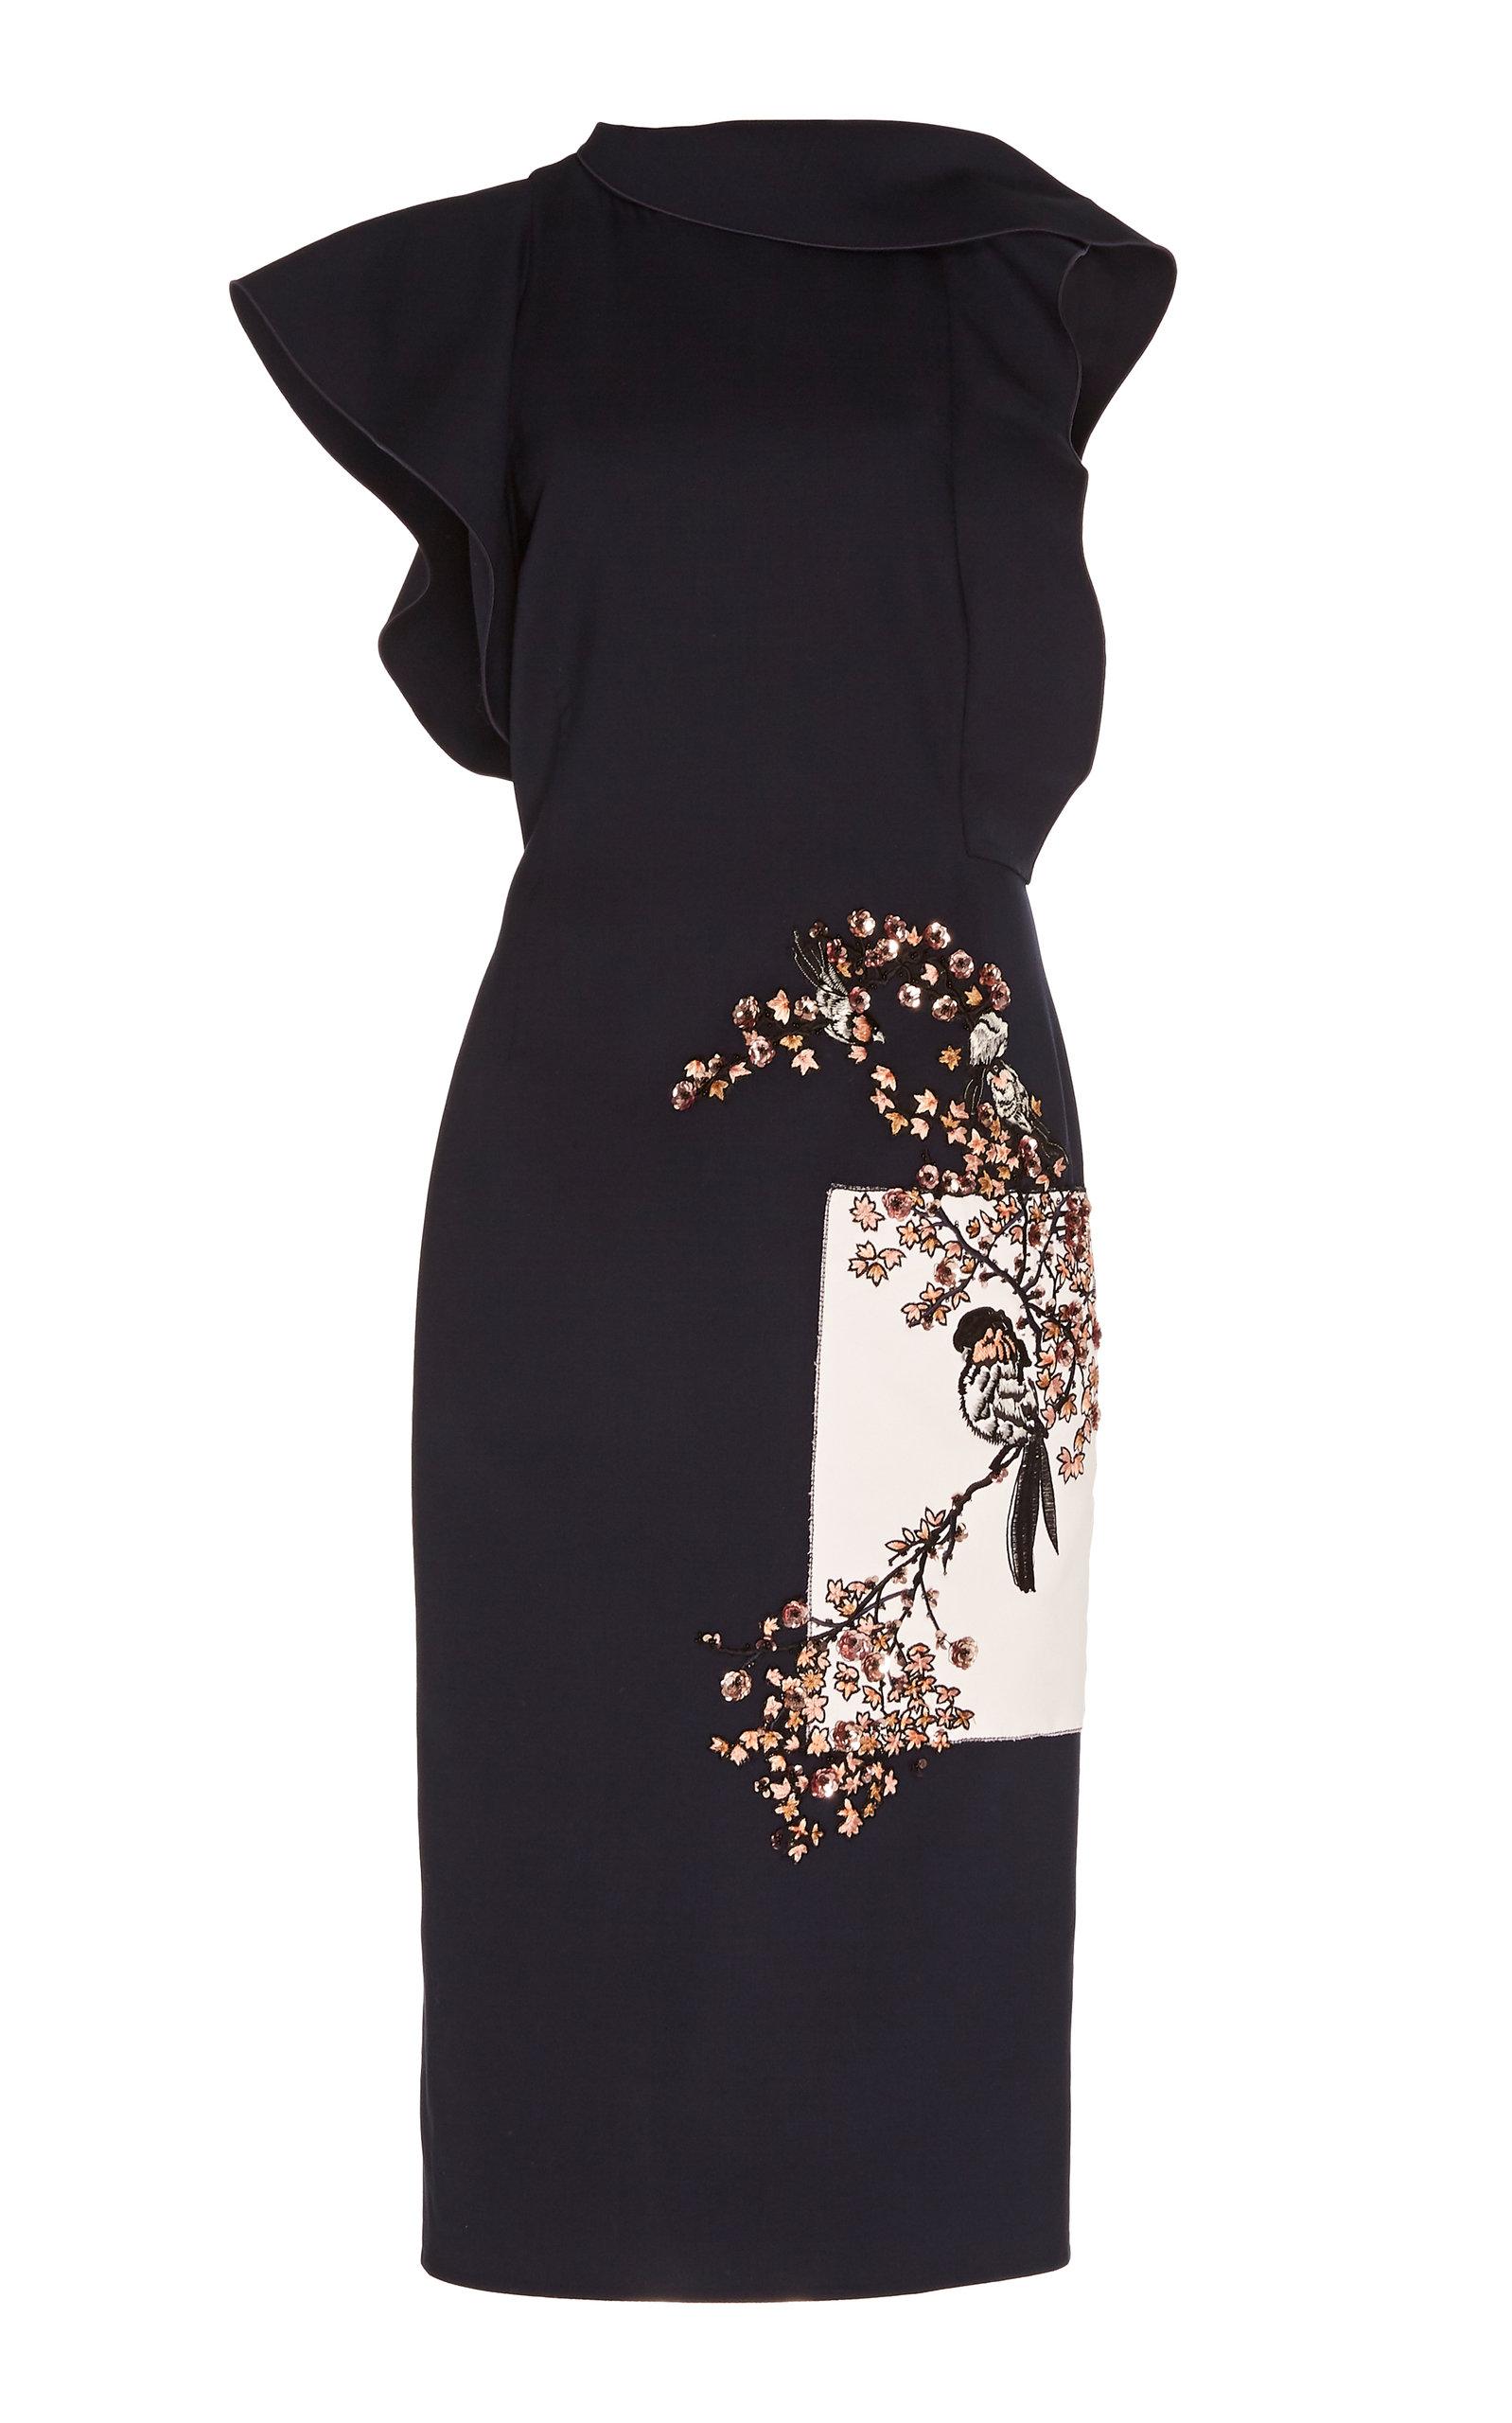 Buy Oscar de la Renta Embellished Ruffled Wool-Blend Midi Dress online, shop Oscar de la Renta at the best price